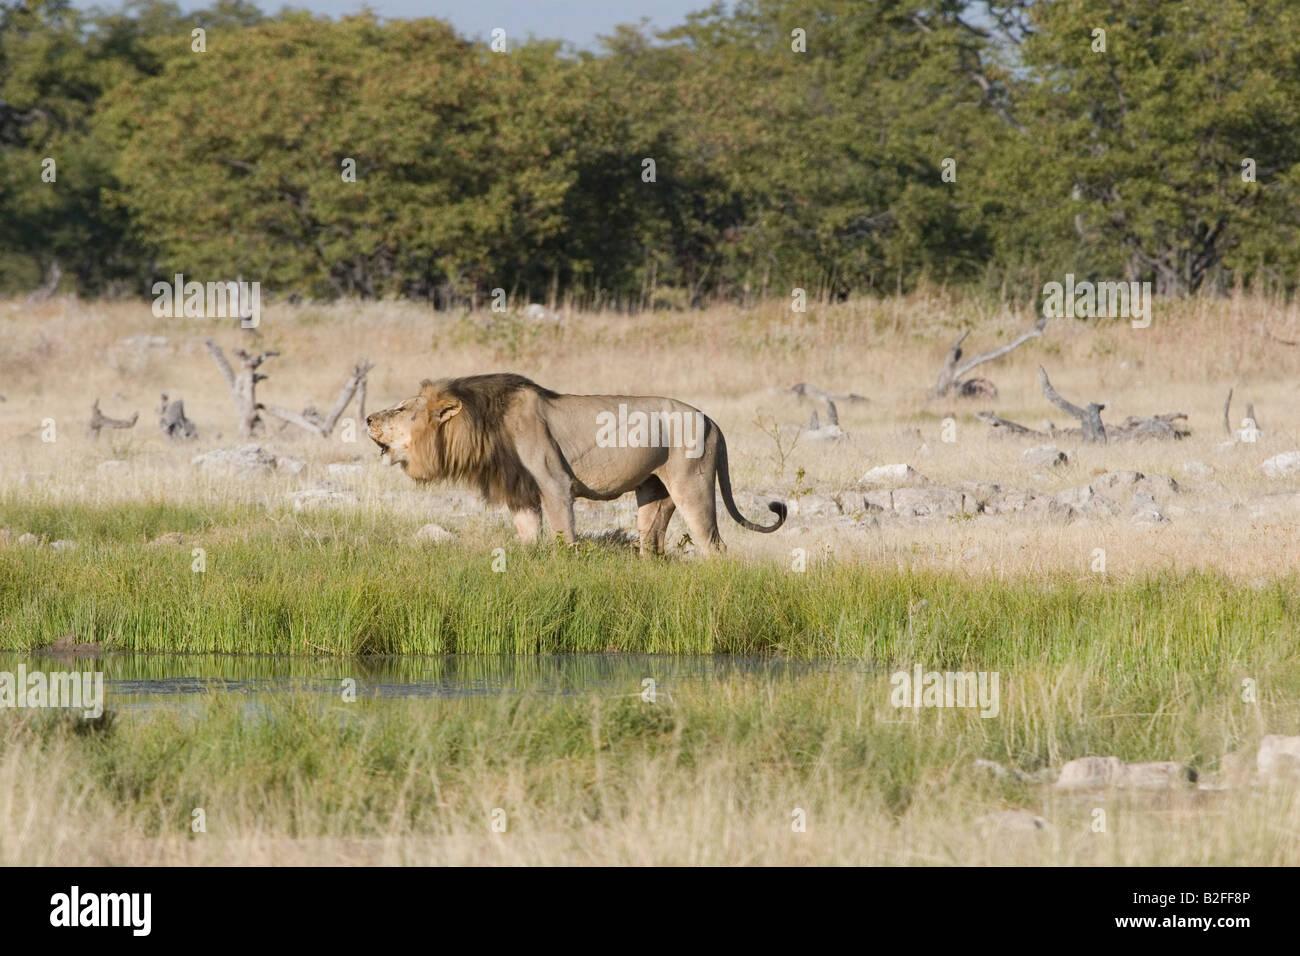 Male Lion Roars - Stock Image